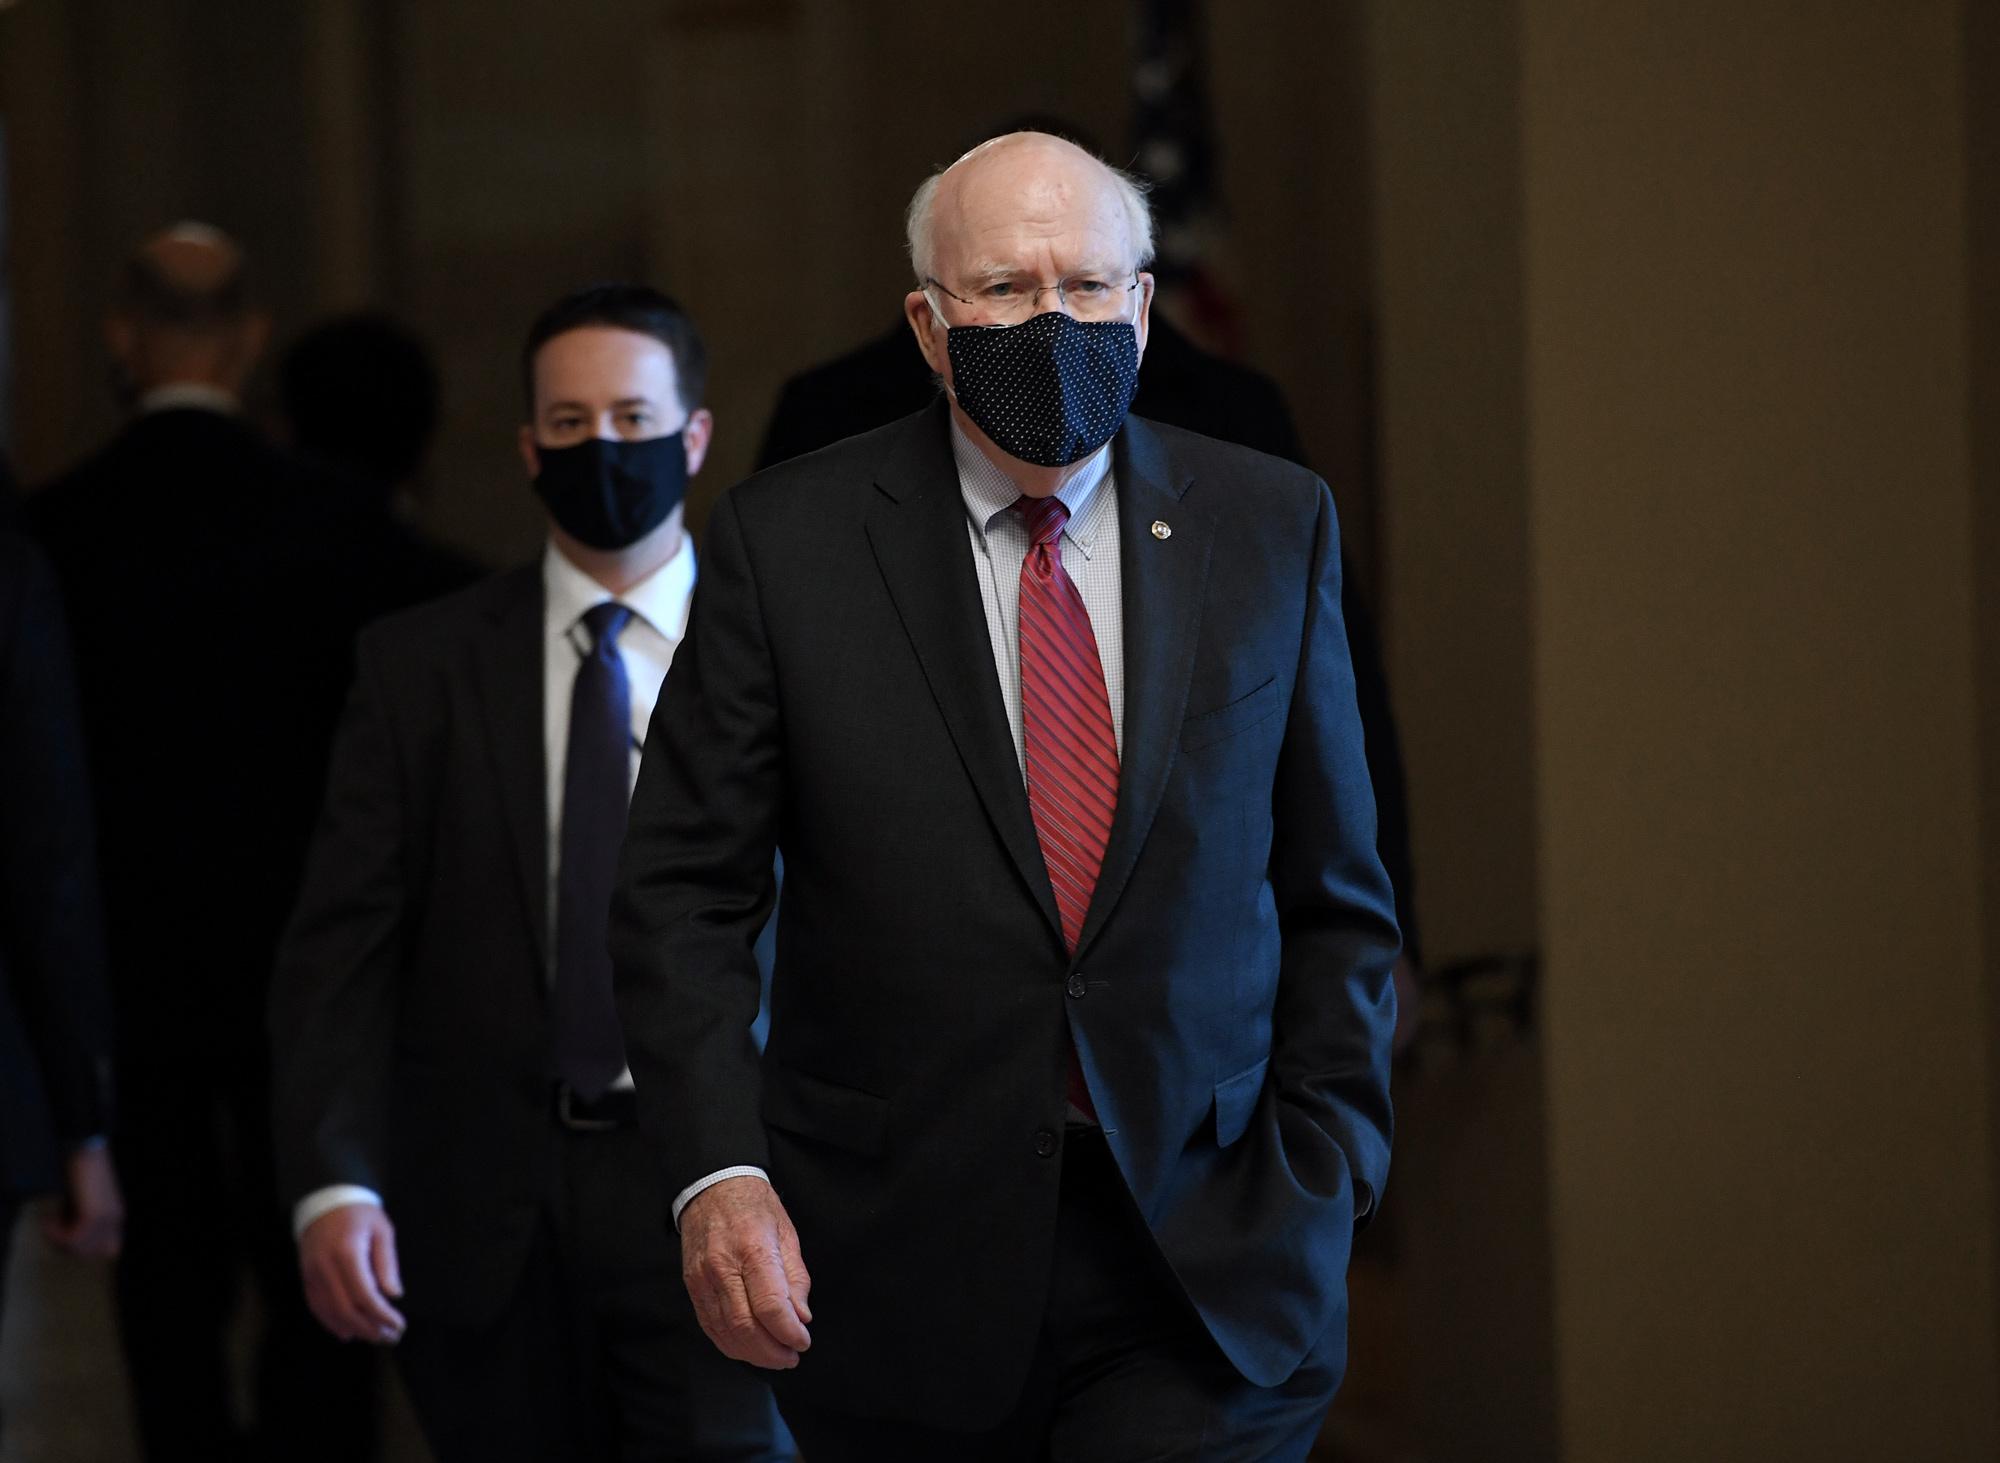 Senator Patrick J. Leahy walks to the Senate floor on Capitol Hill on February 2 in Washington, DC.